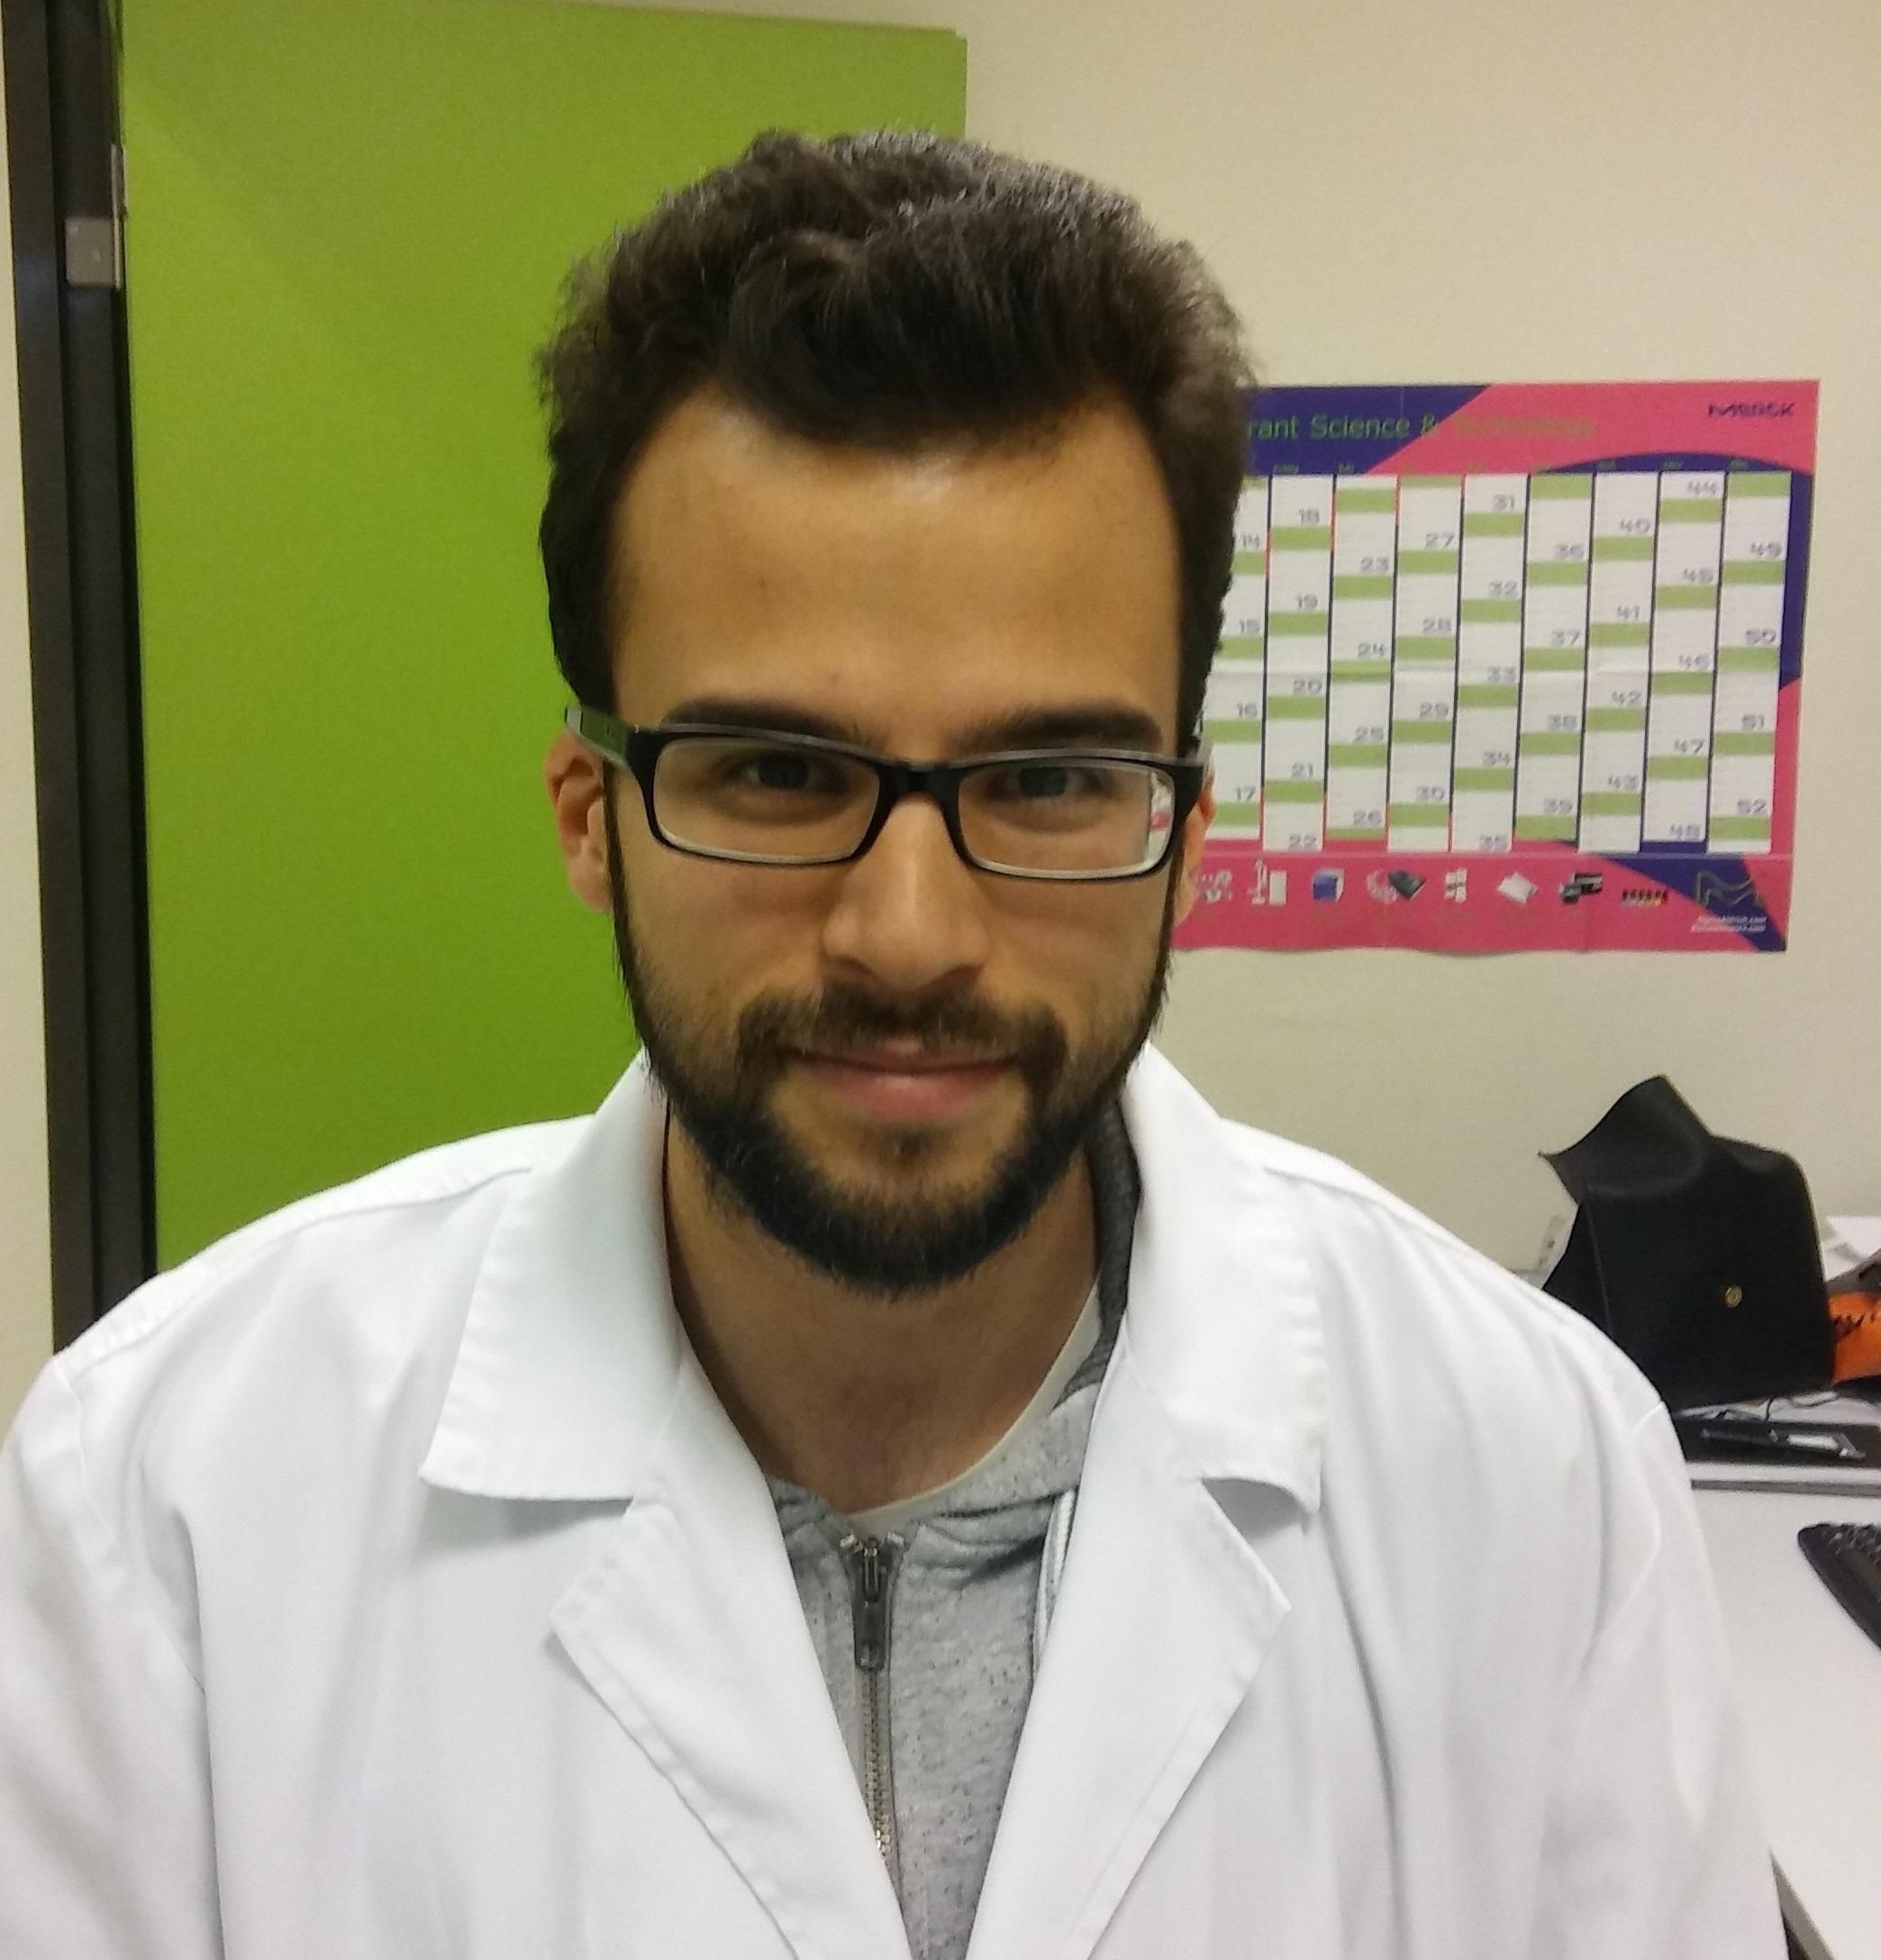 Daniel González Mancebo